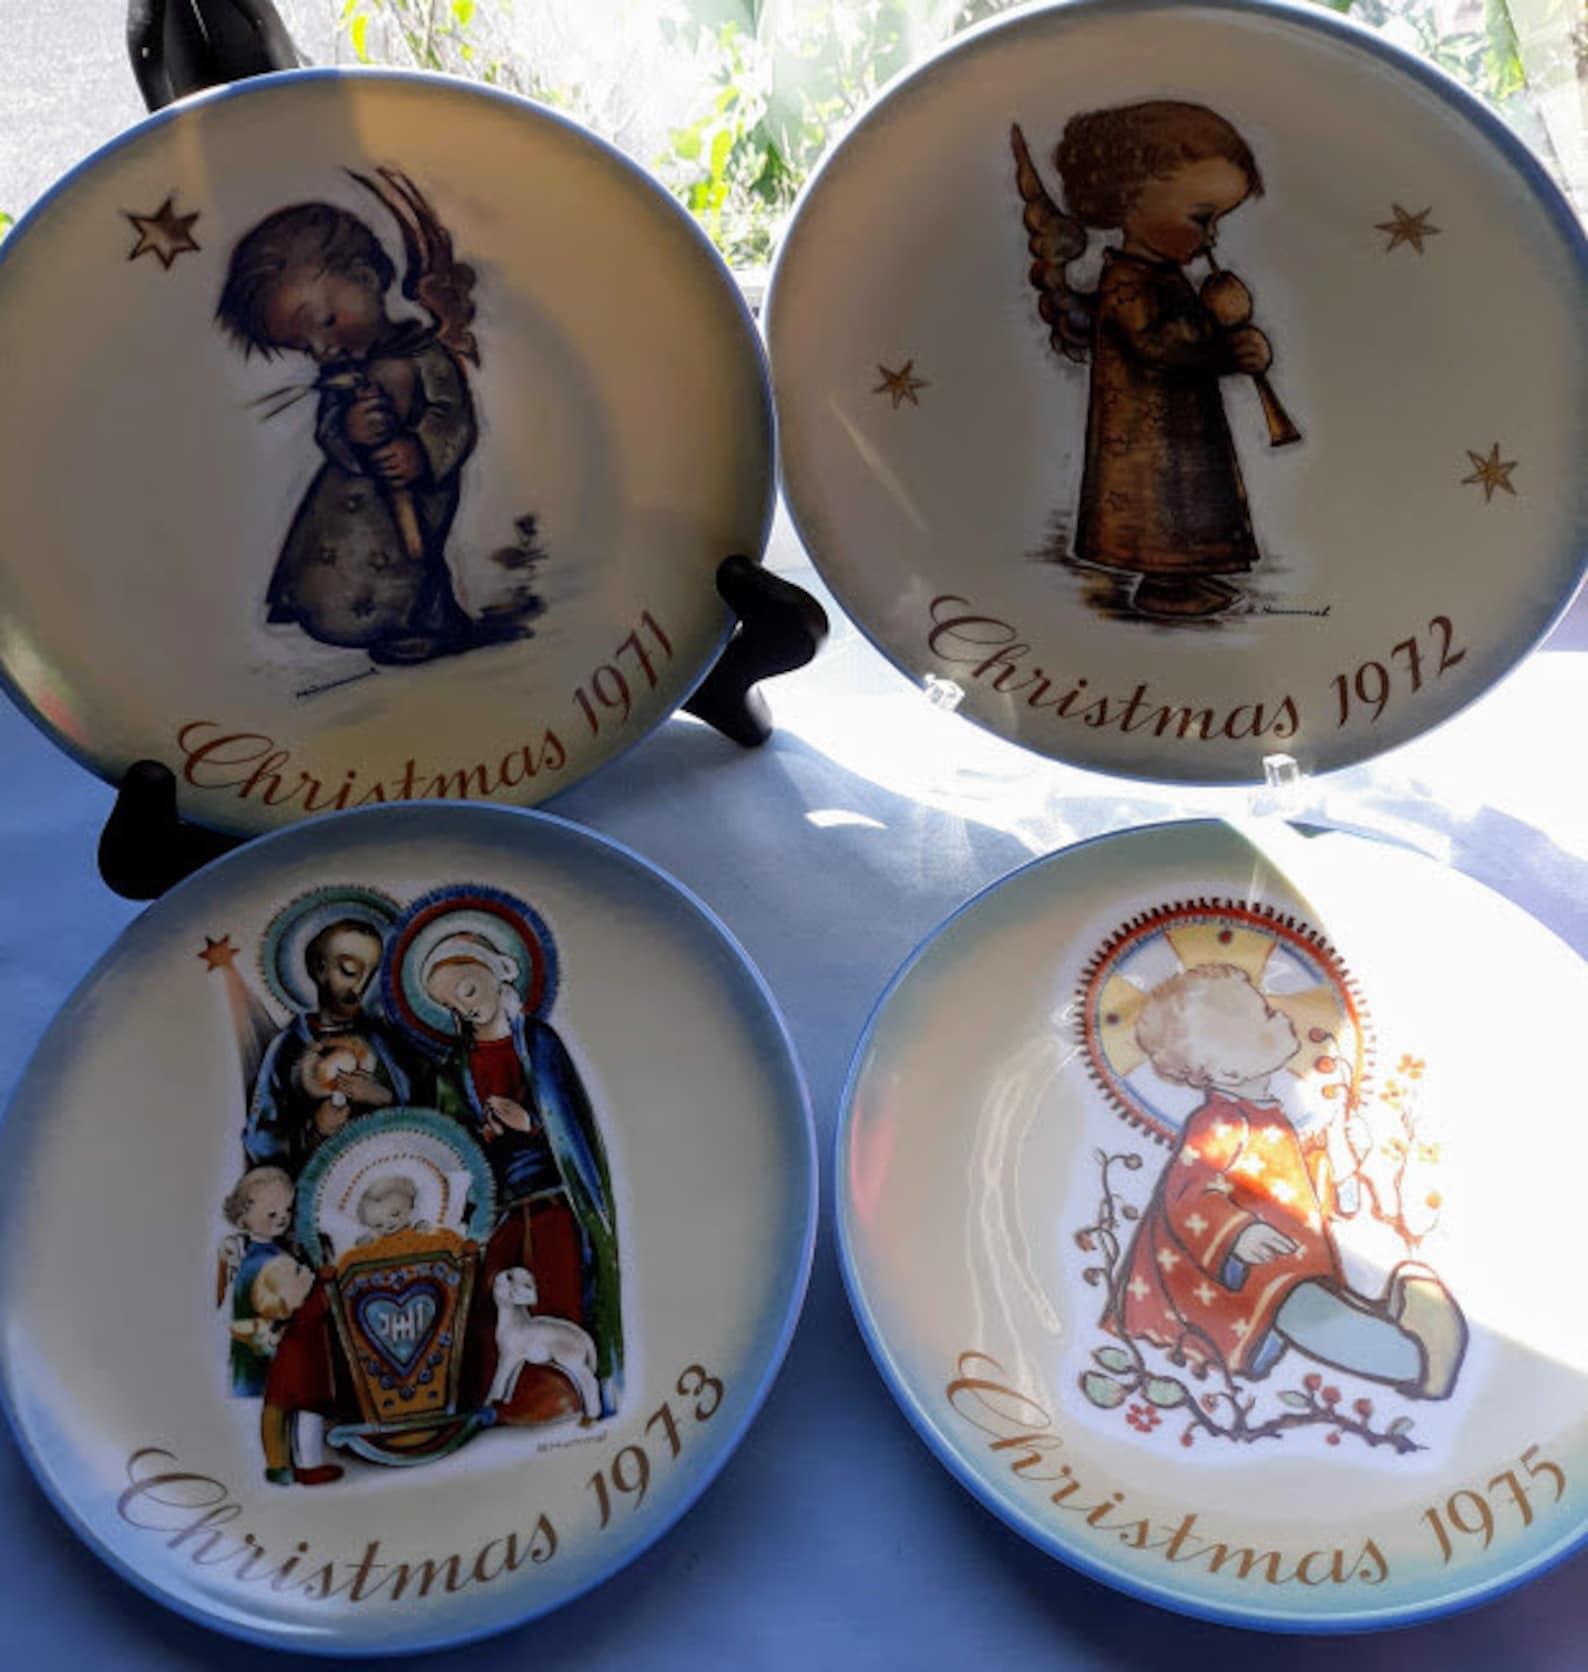 Vintage Lot of Four Hummel Christmas Plates, 1971, 1972, 1973 and 1975, Berta Hummel Artwork